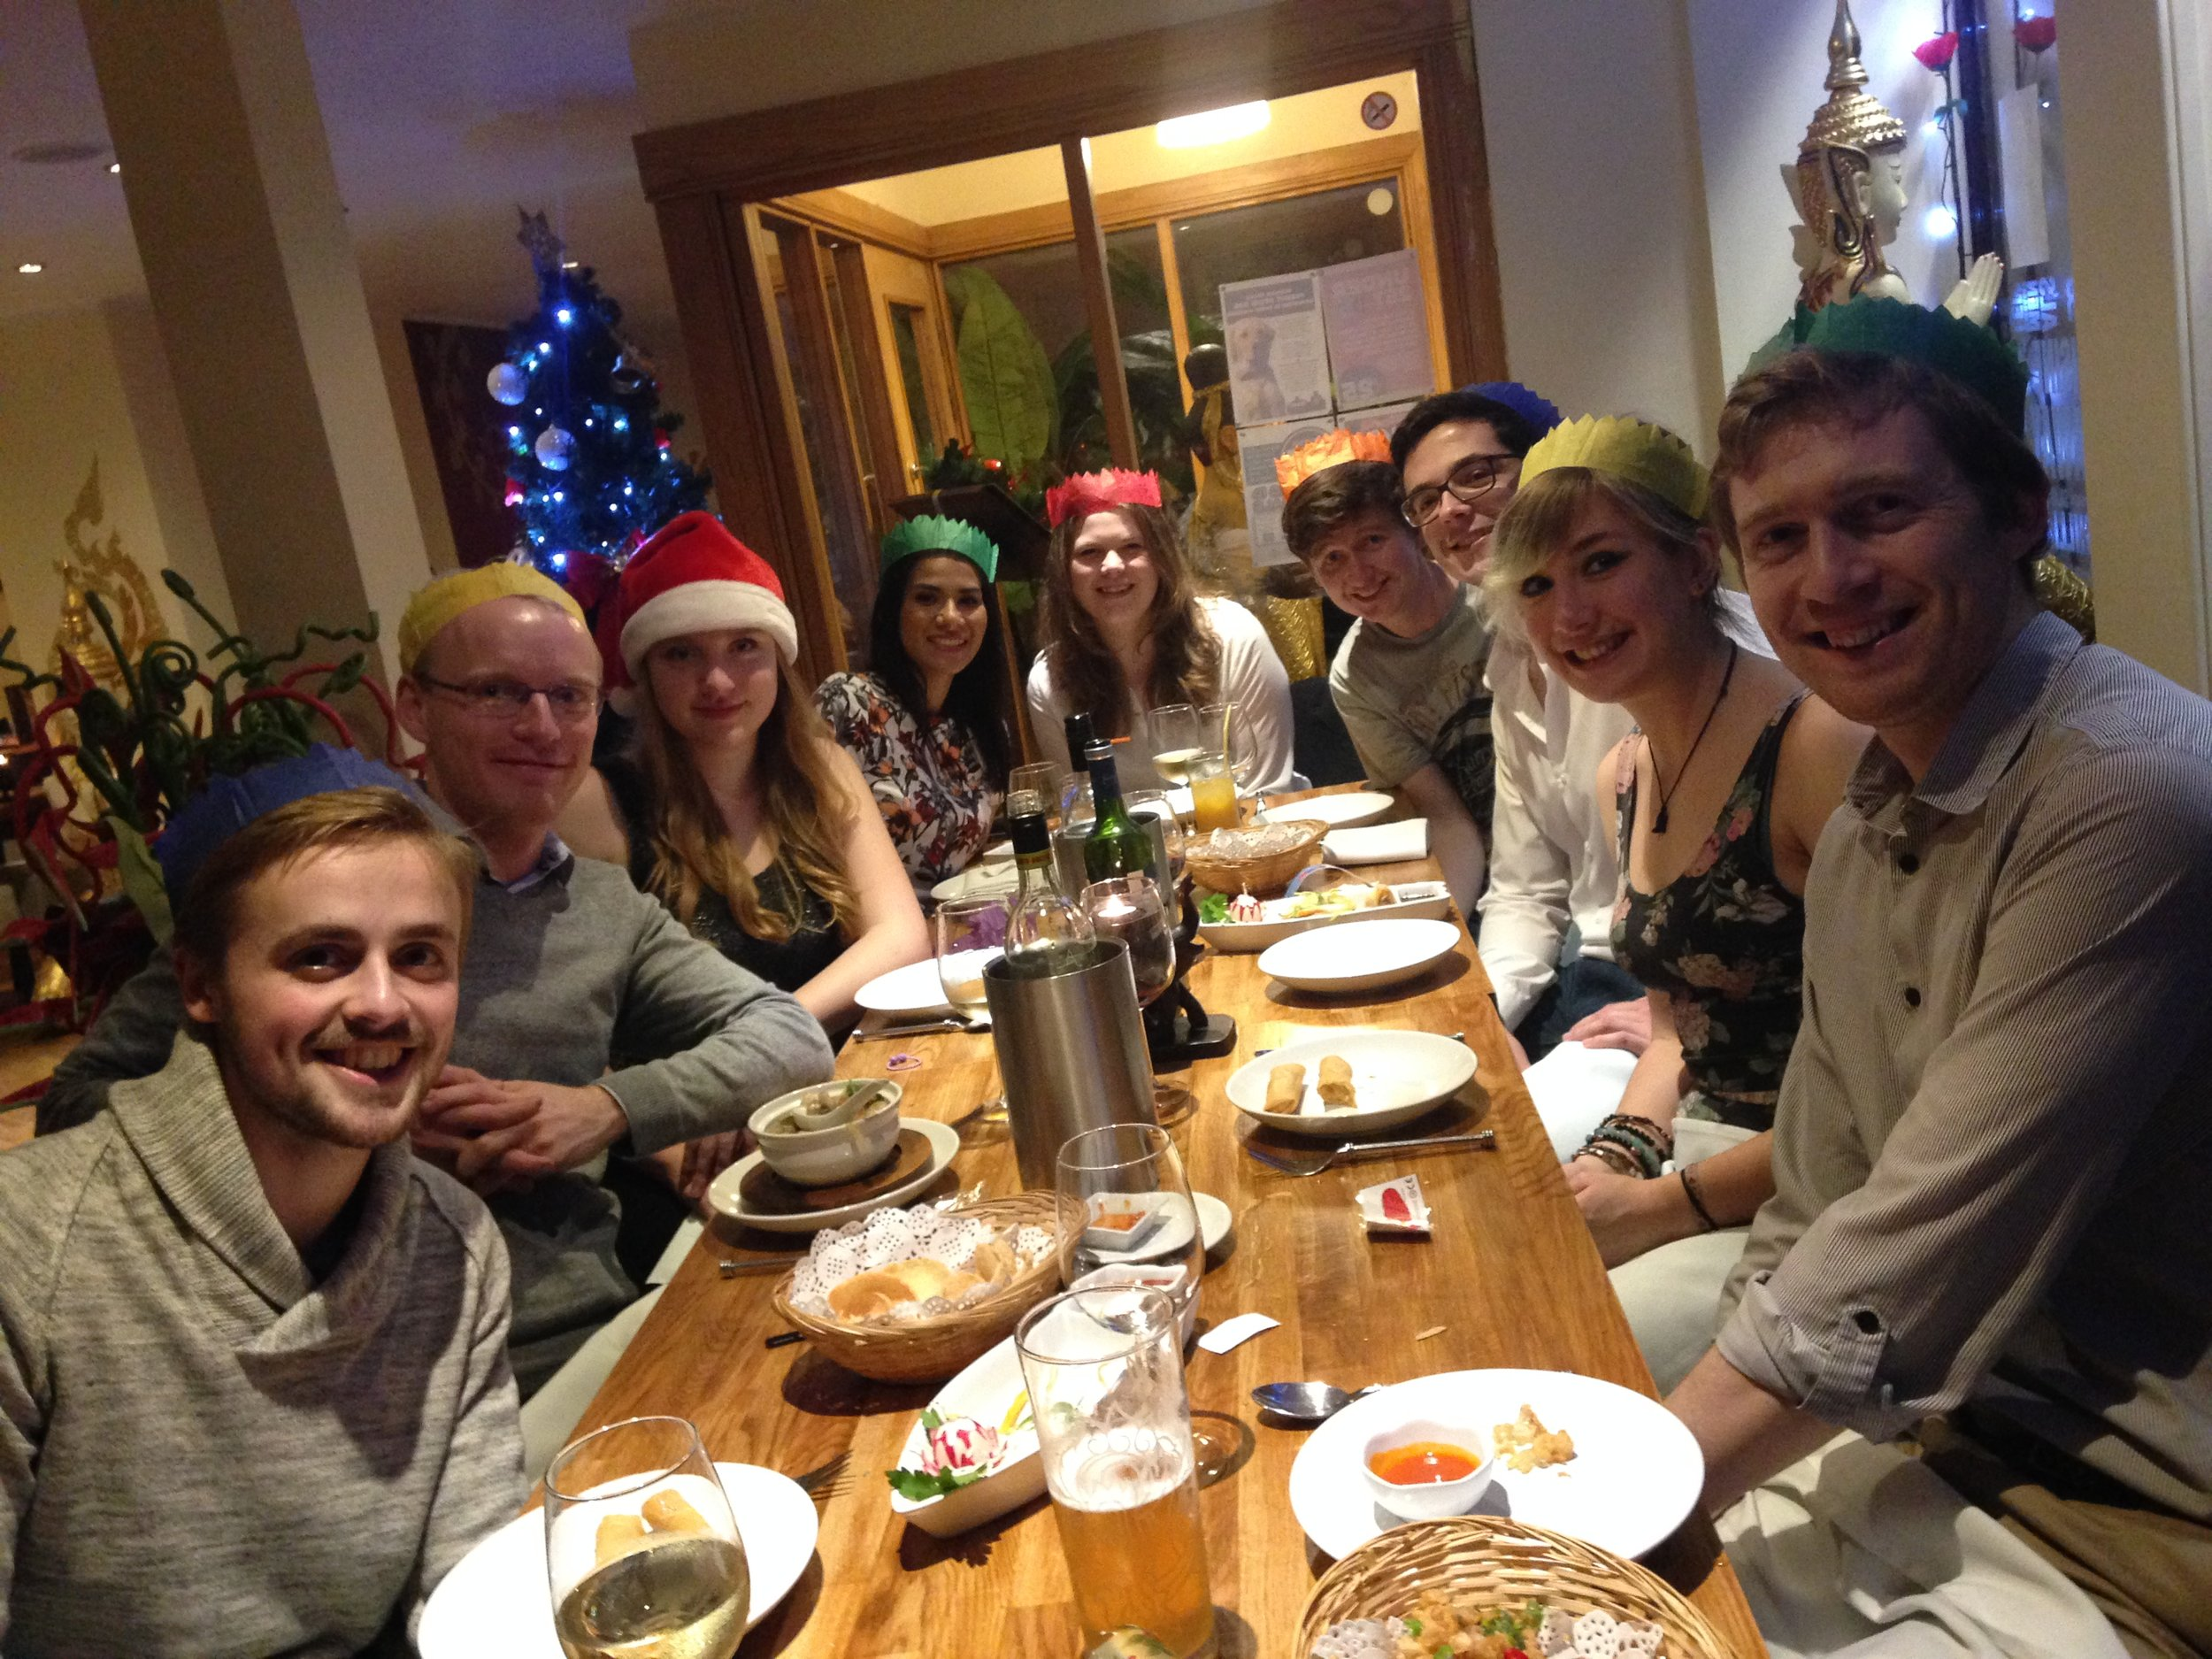 Group Christmas Dinner 2015. From left to right: Archie, Paul, Gemma, Aisha, Alex, Chris, Jack, Jasmine, and James.